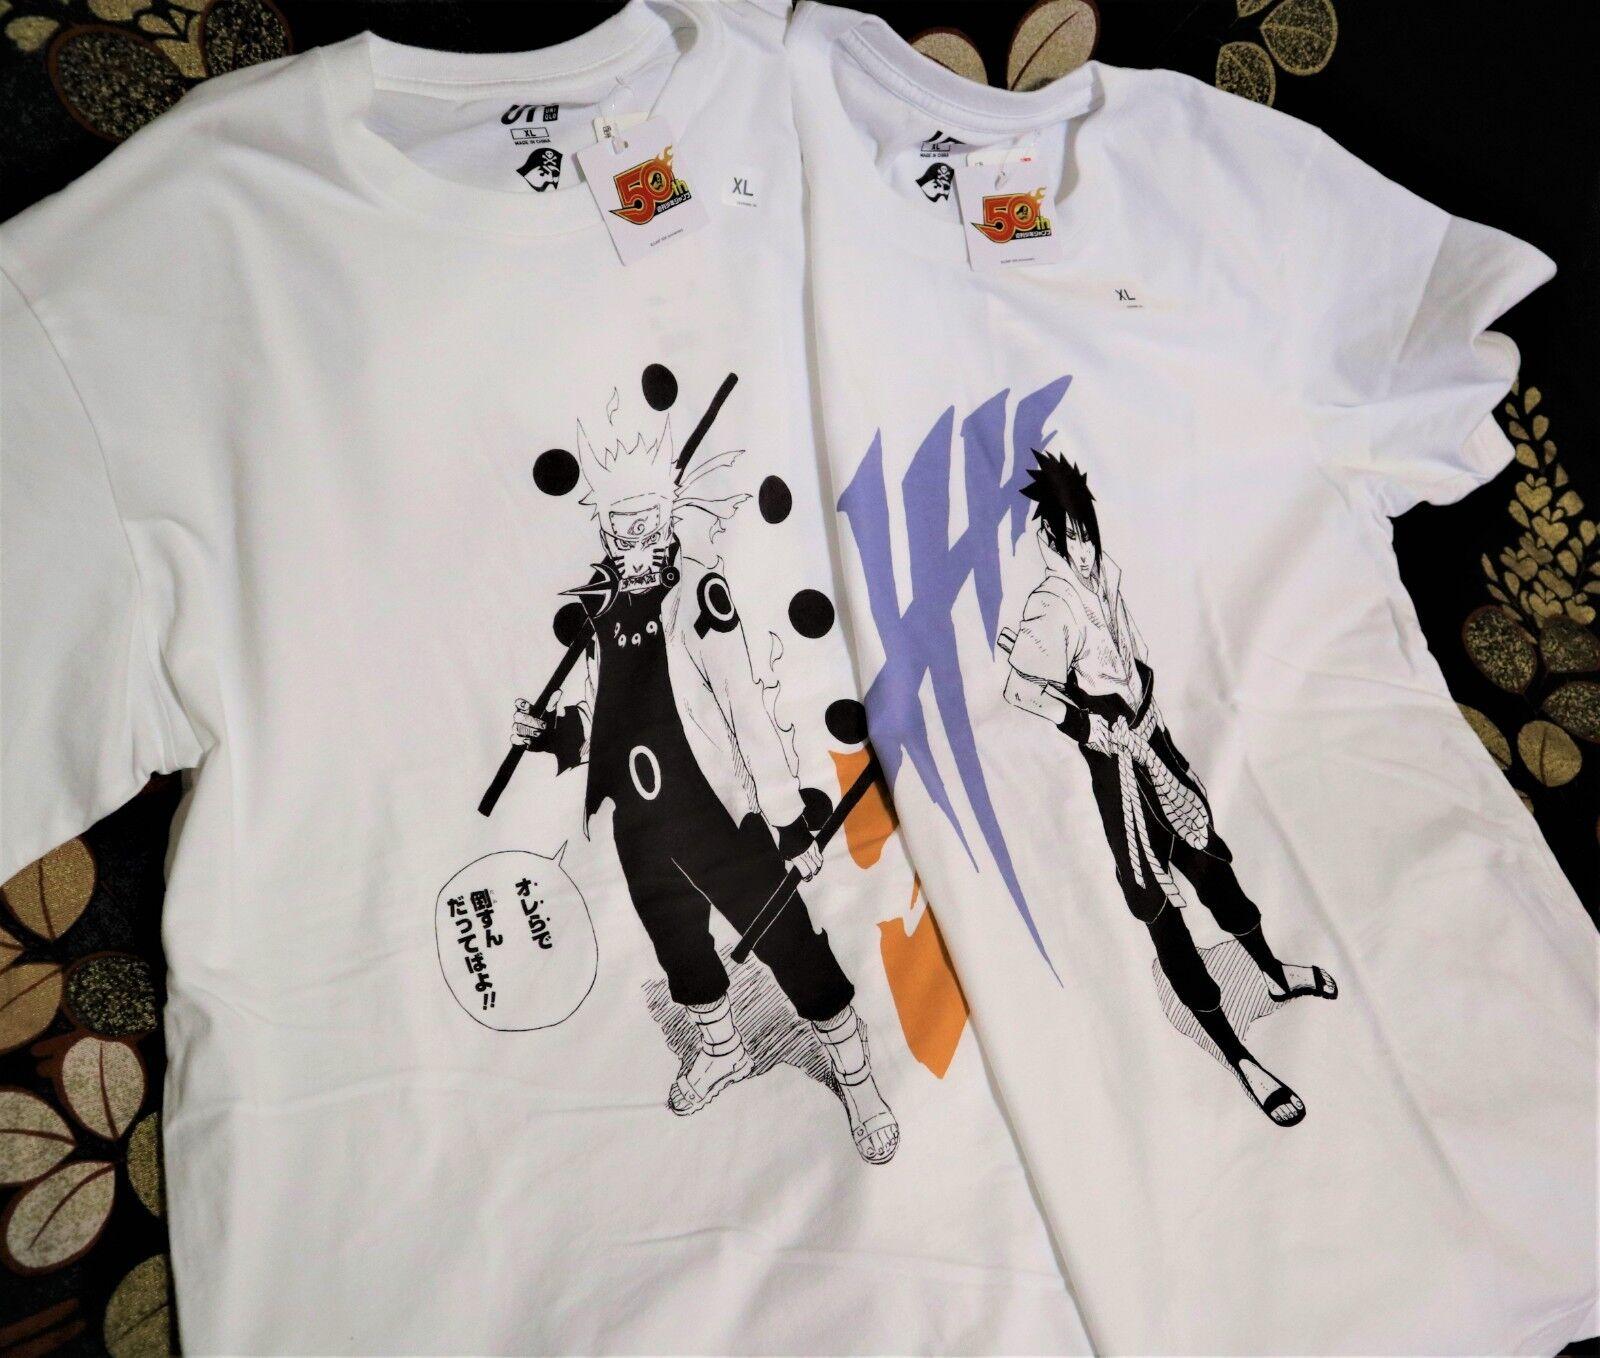 d6256f637 Naruto & Sasuke X UNIQLO Set of 2 Shonen Jump 50th Graphic Tee Shirts S,